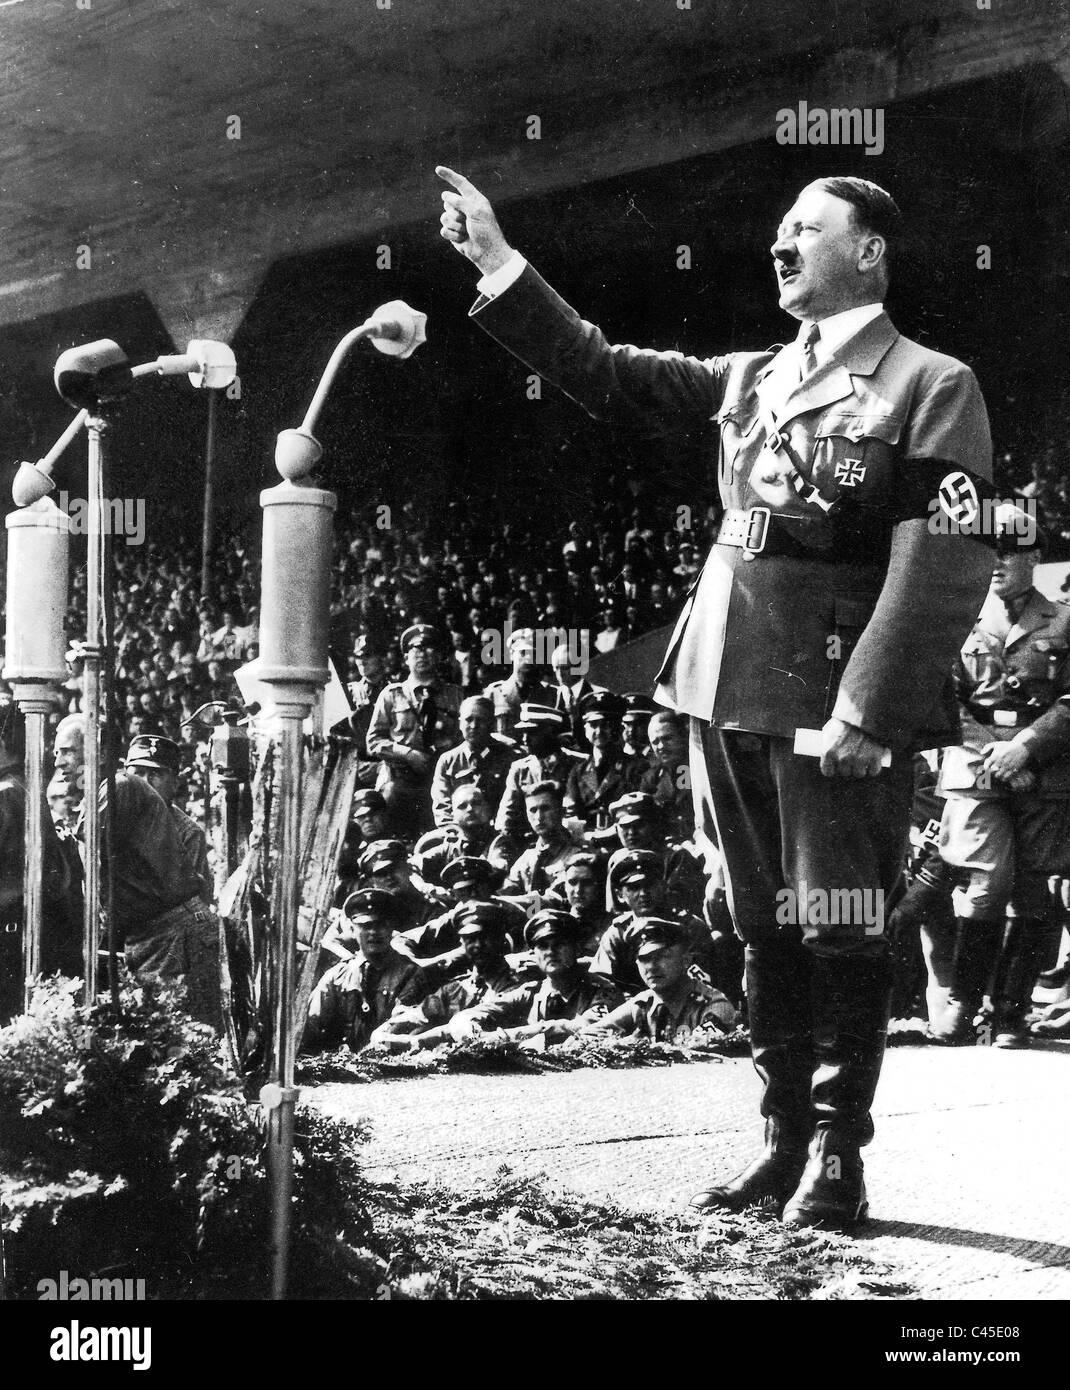 adolf hitler in a speech on the nazi party congress 1934